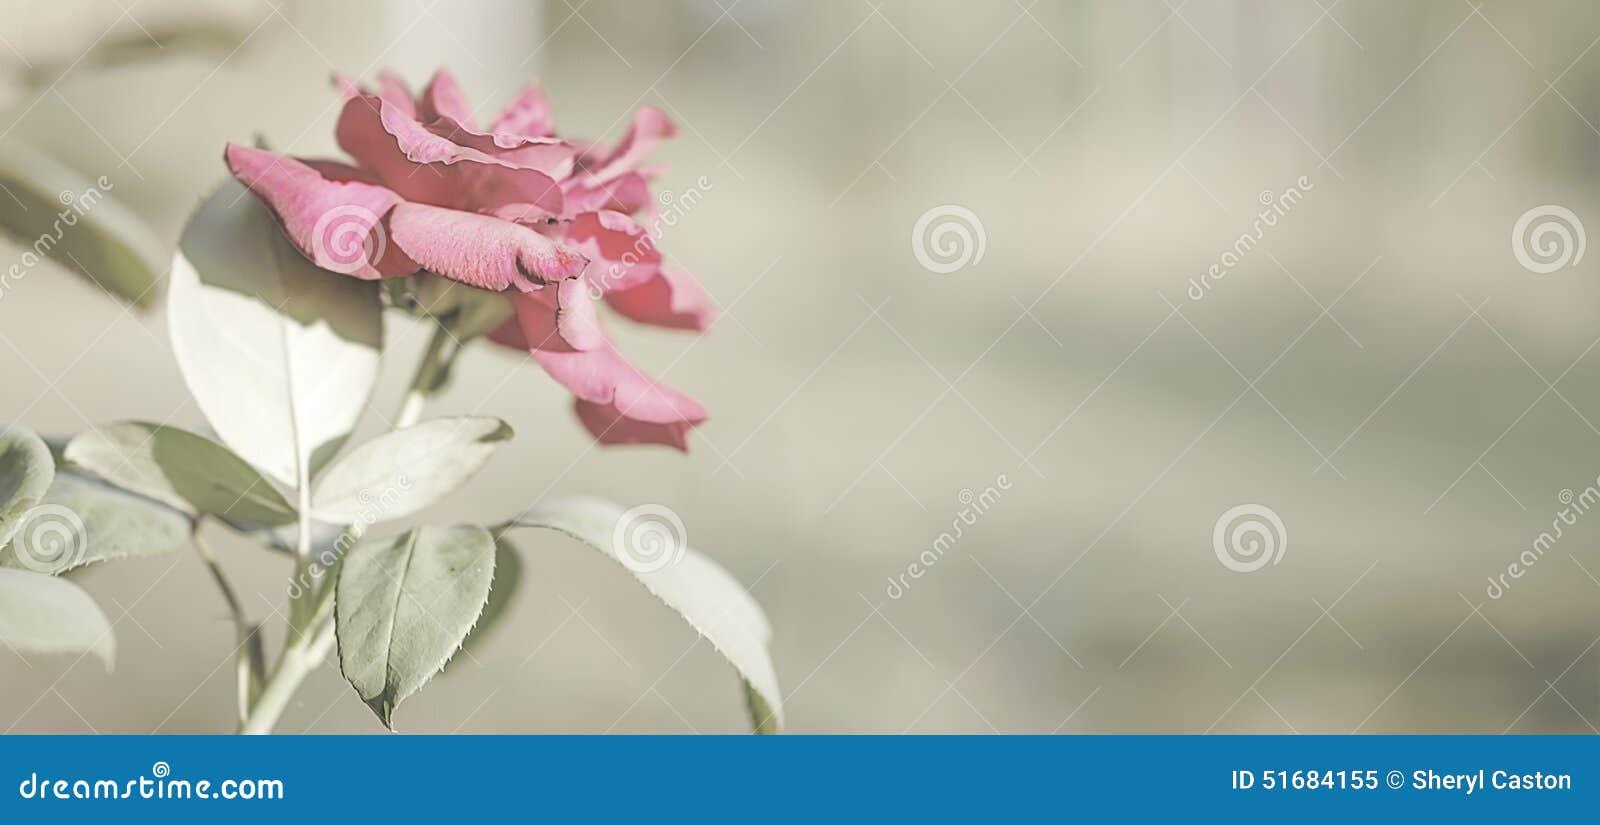 rose flower sympathy card background